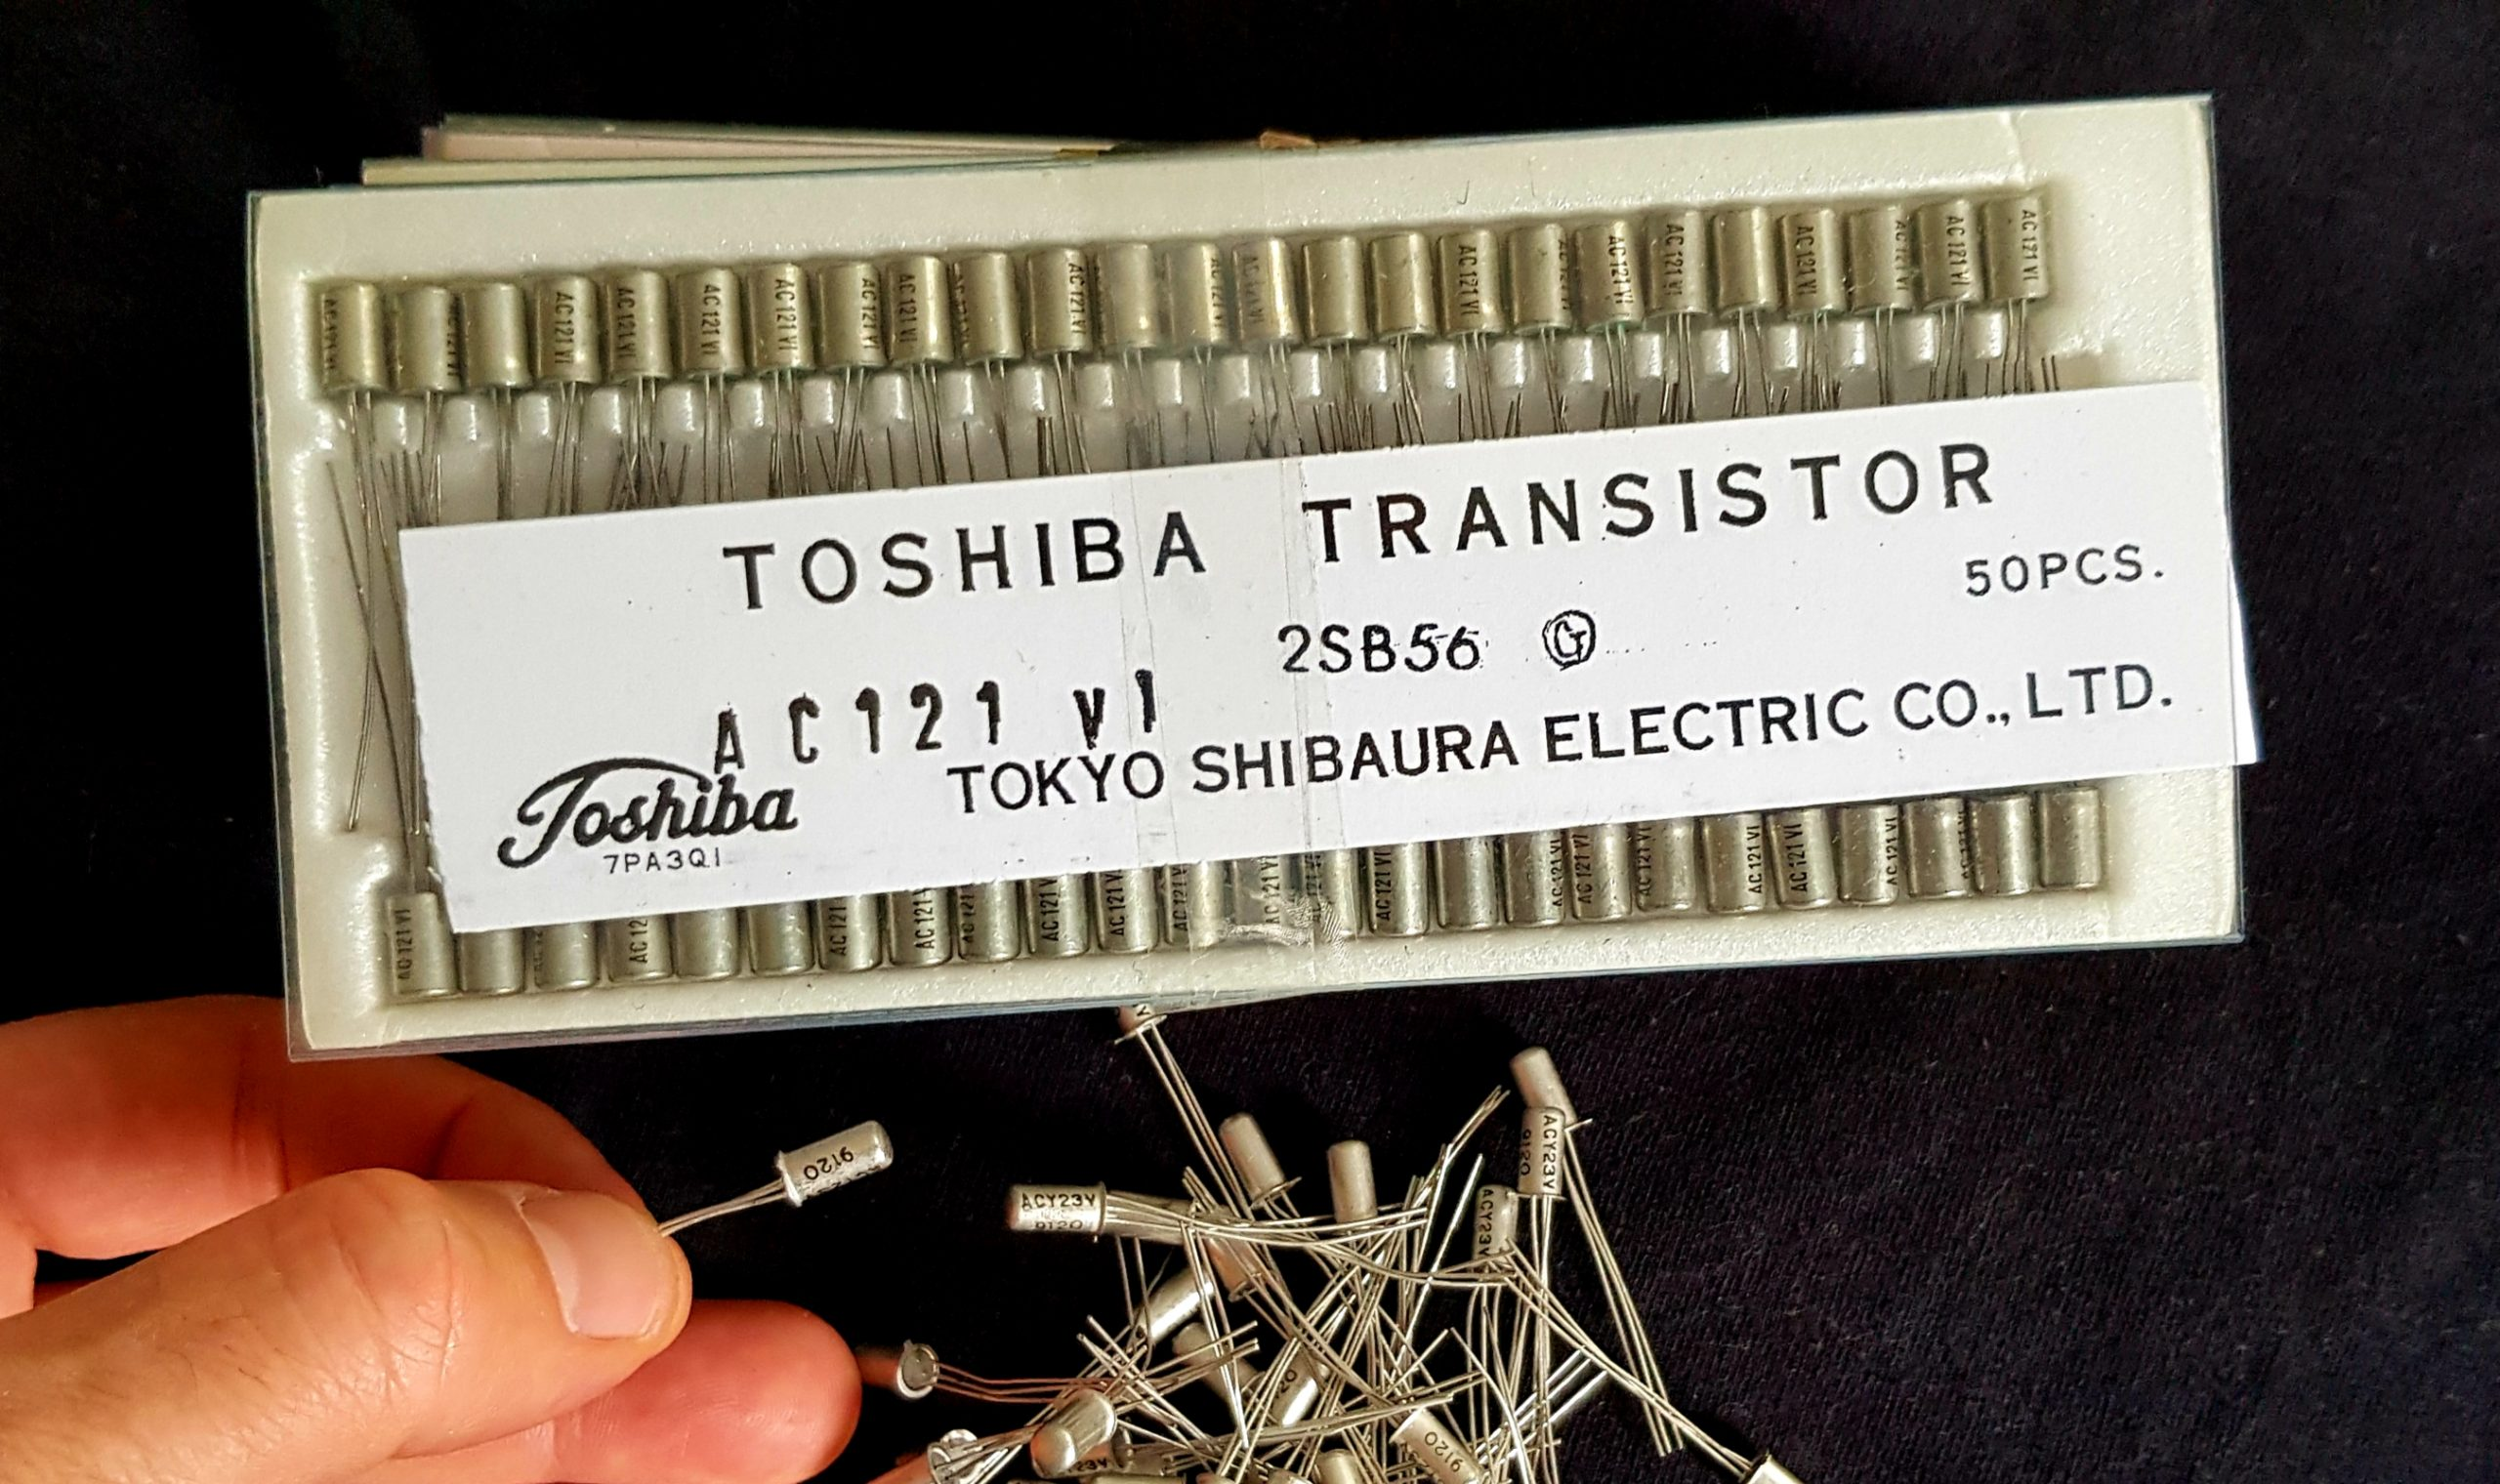 PNP Germanium Transistor Kit – For Classic Fuzz, Tonebender, Rangemaster Builds